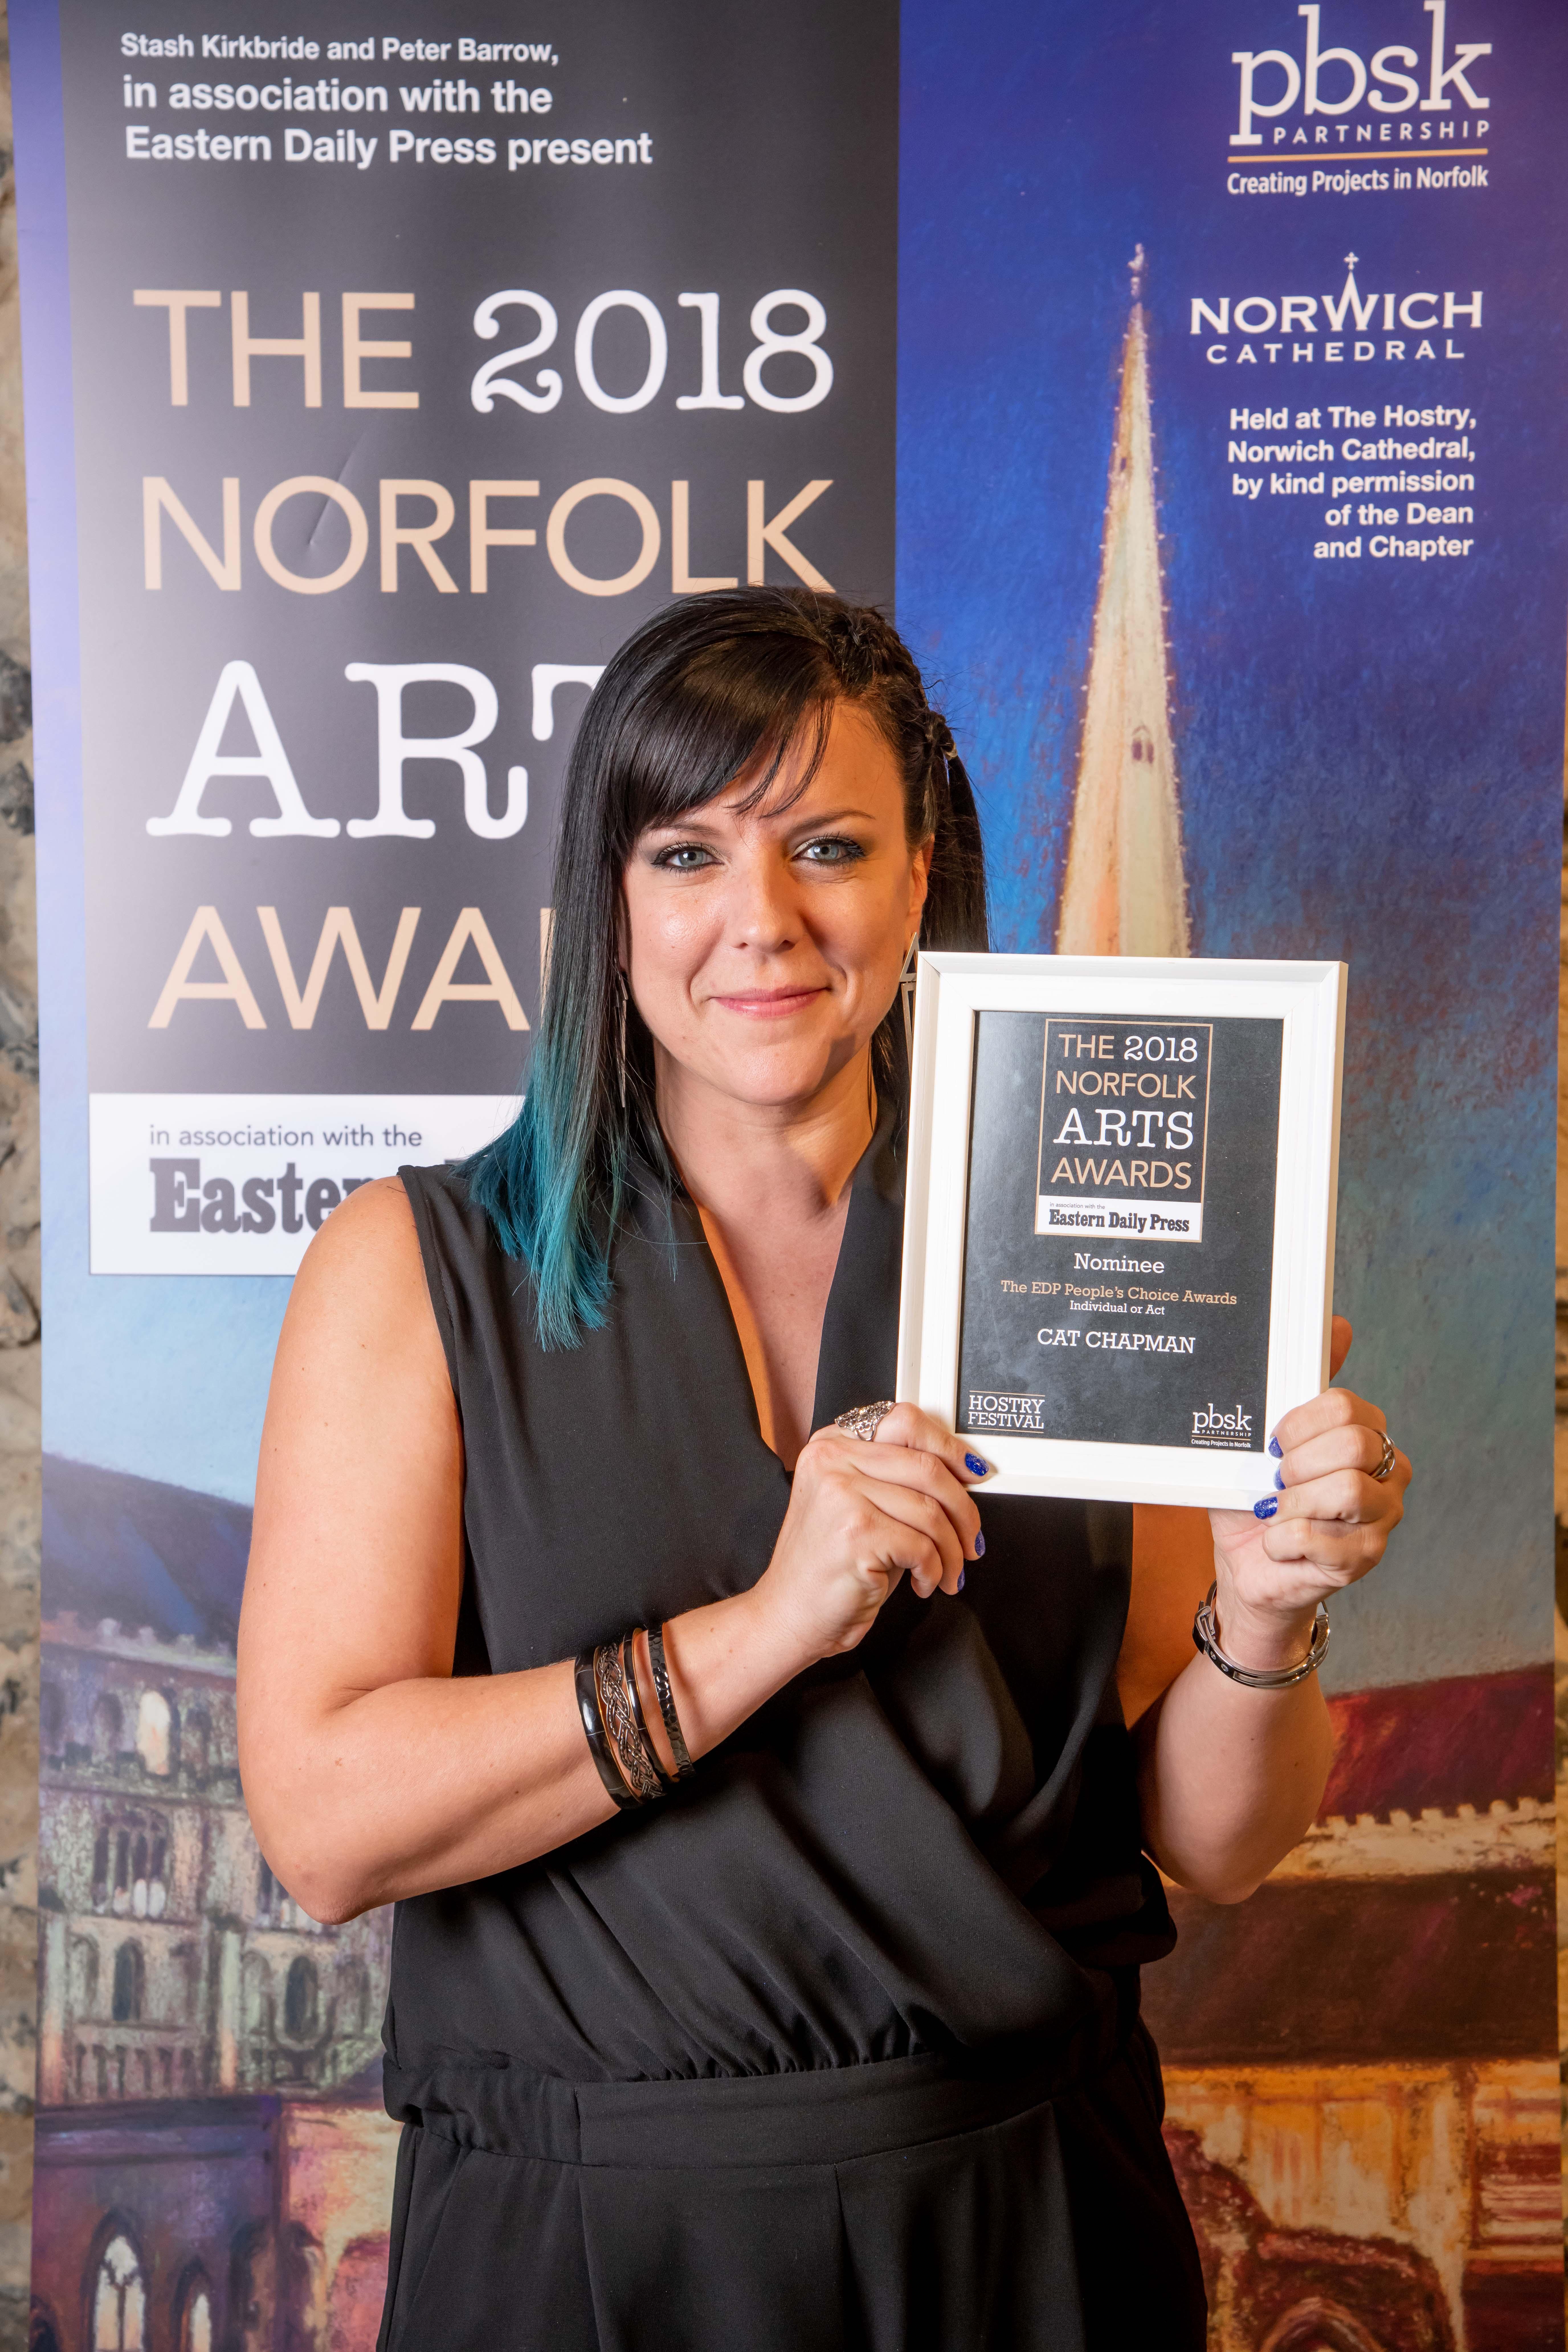 Norfolk Arts Awards 2018 at The Hostry at Norwich Cathedral. Photo credit ©Simon Finlay Photography.